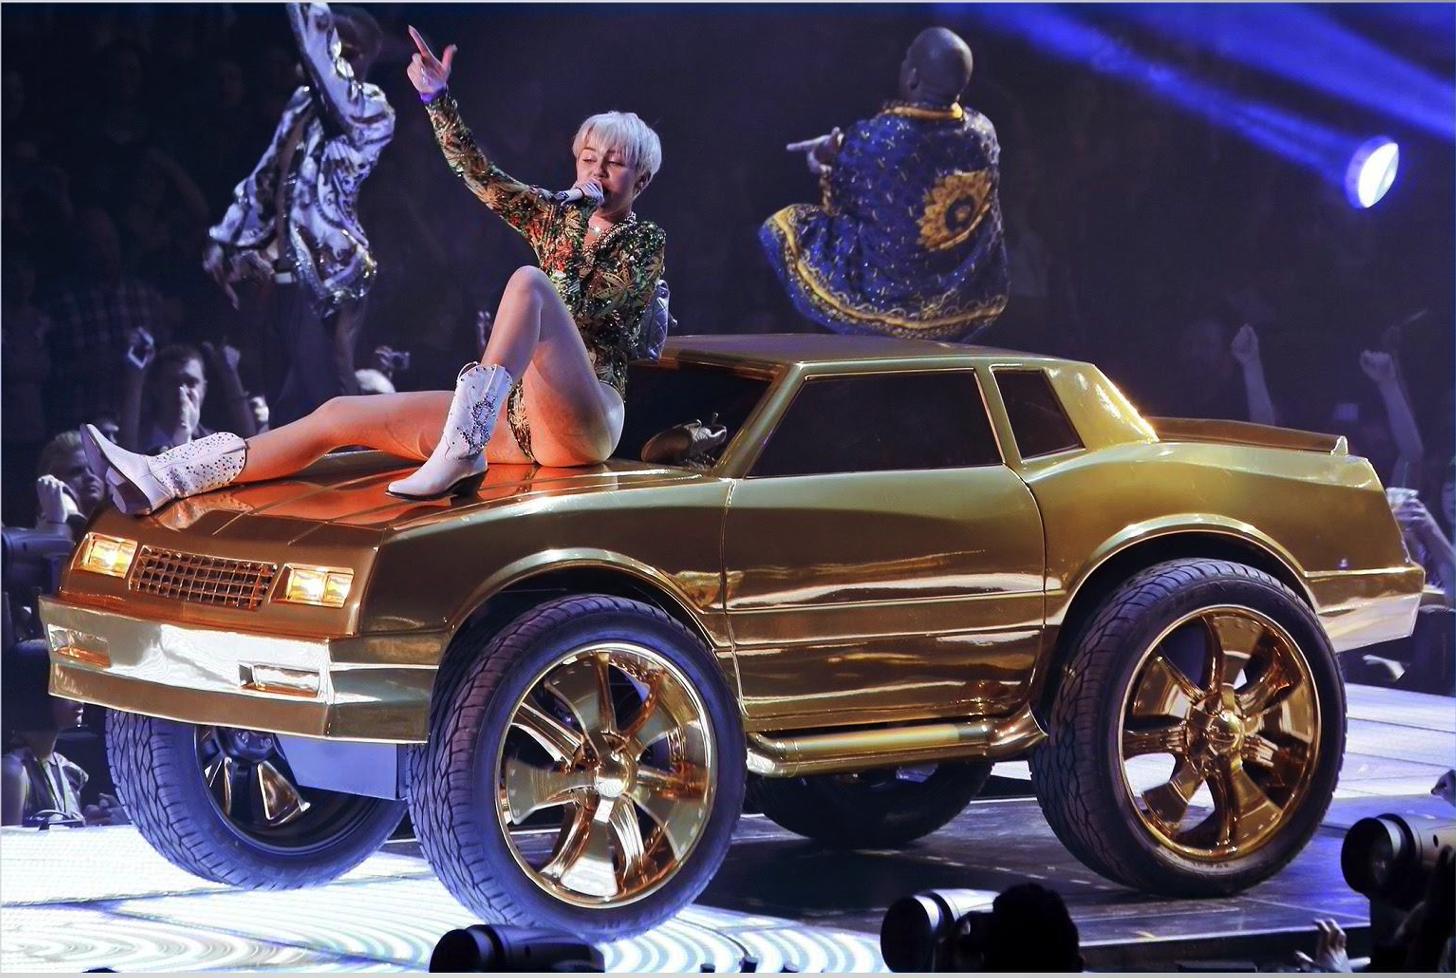 Miley Cyrus Custom Car: 3D Design, CNC Machining, Fiberglass Molding & Casting, Vinyl Wrap, Mechanical Fabrication with RC Controls.